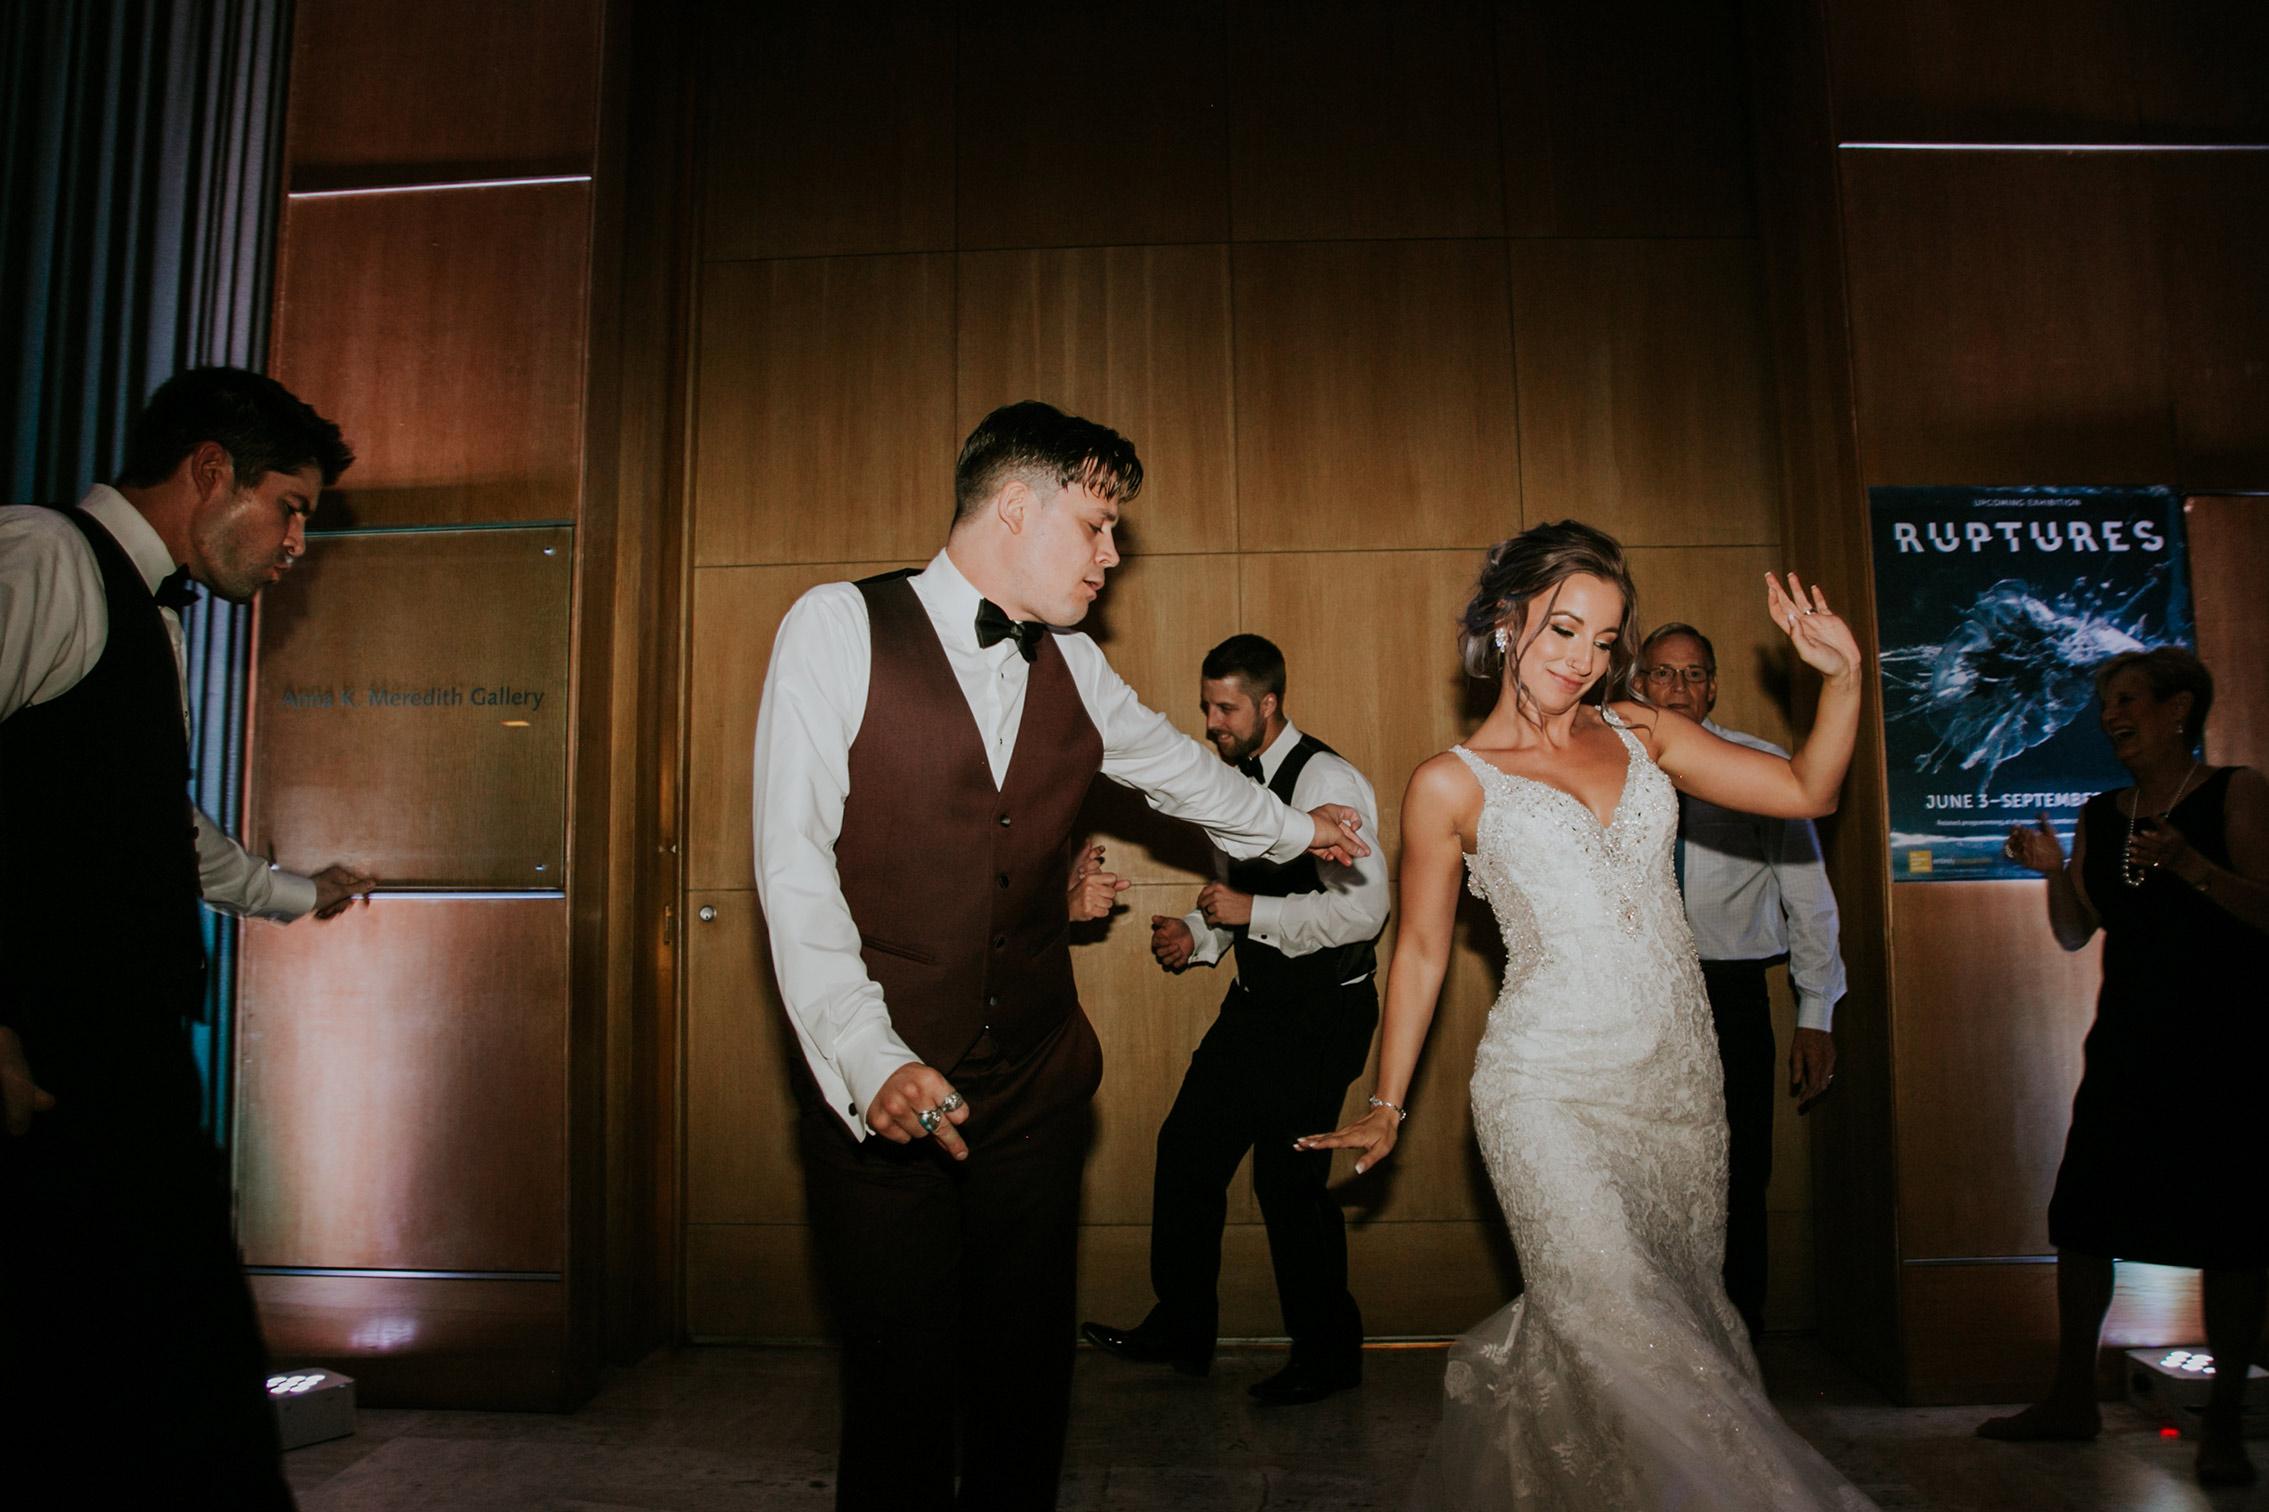 bride-groom-getting-down-next-to-eachother-on-dance-floor-desmoines-iowa-art-center-raelyn-ramey-photography.jpg